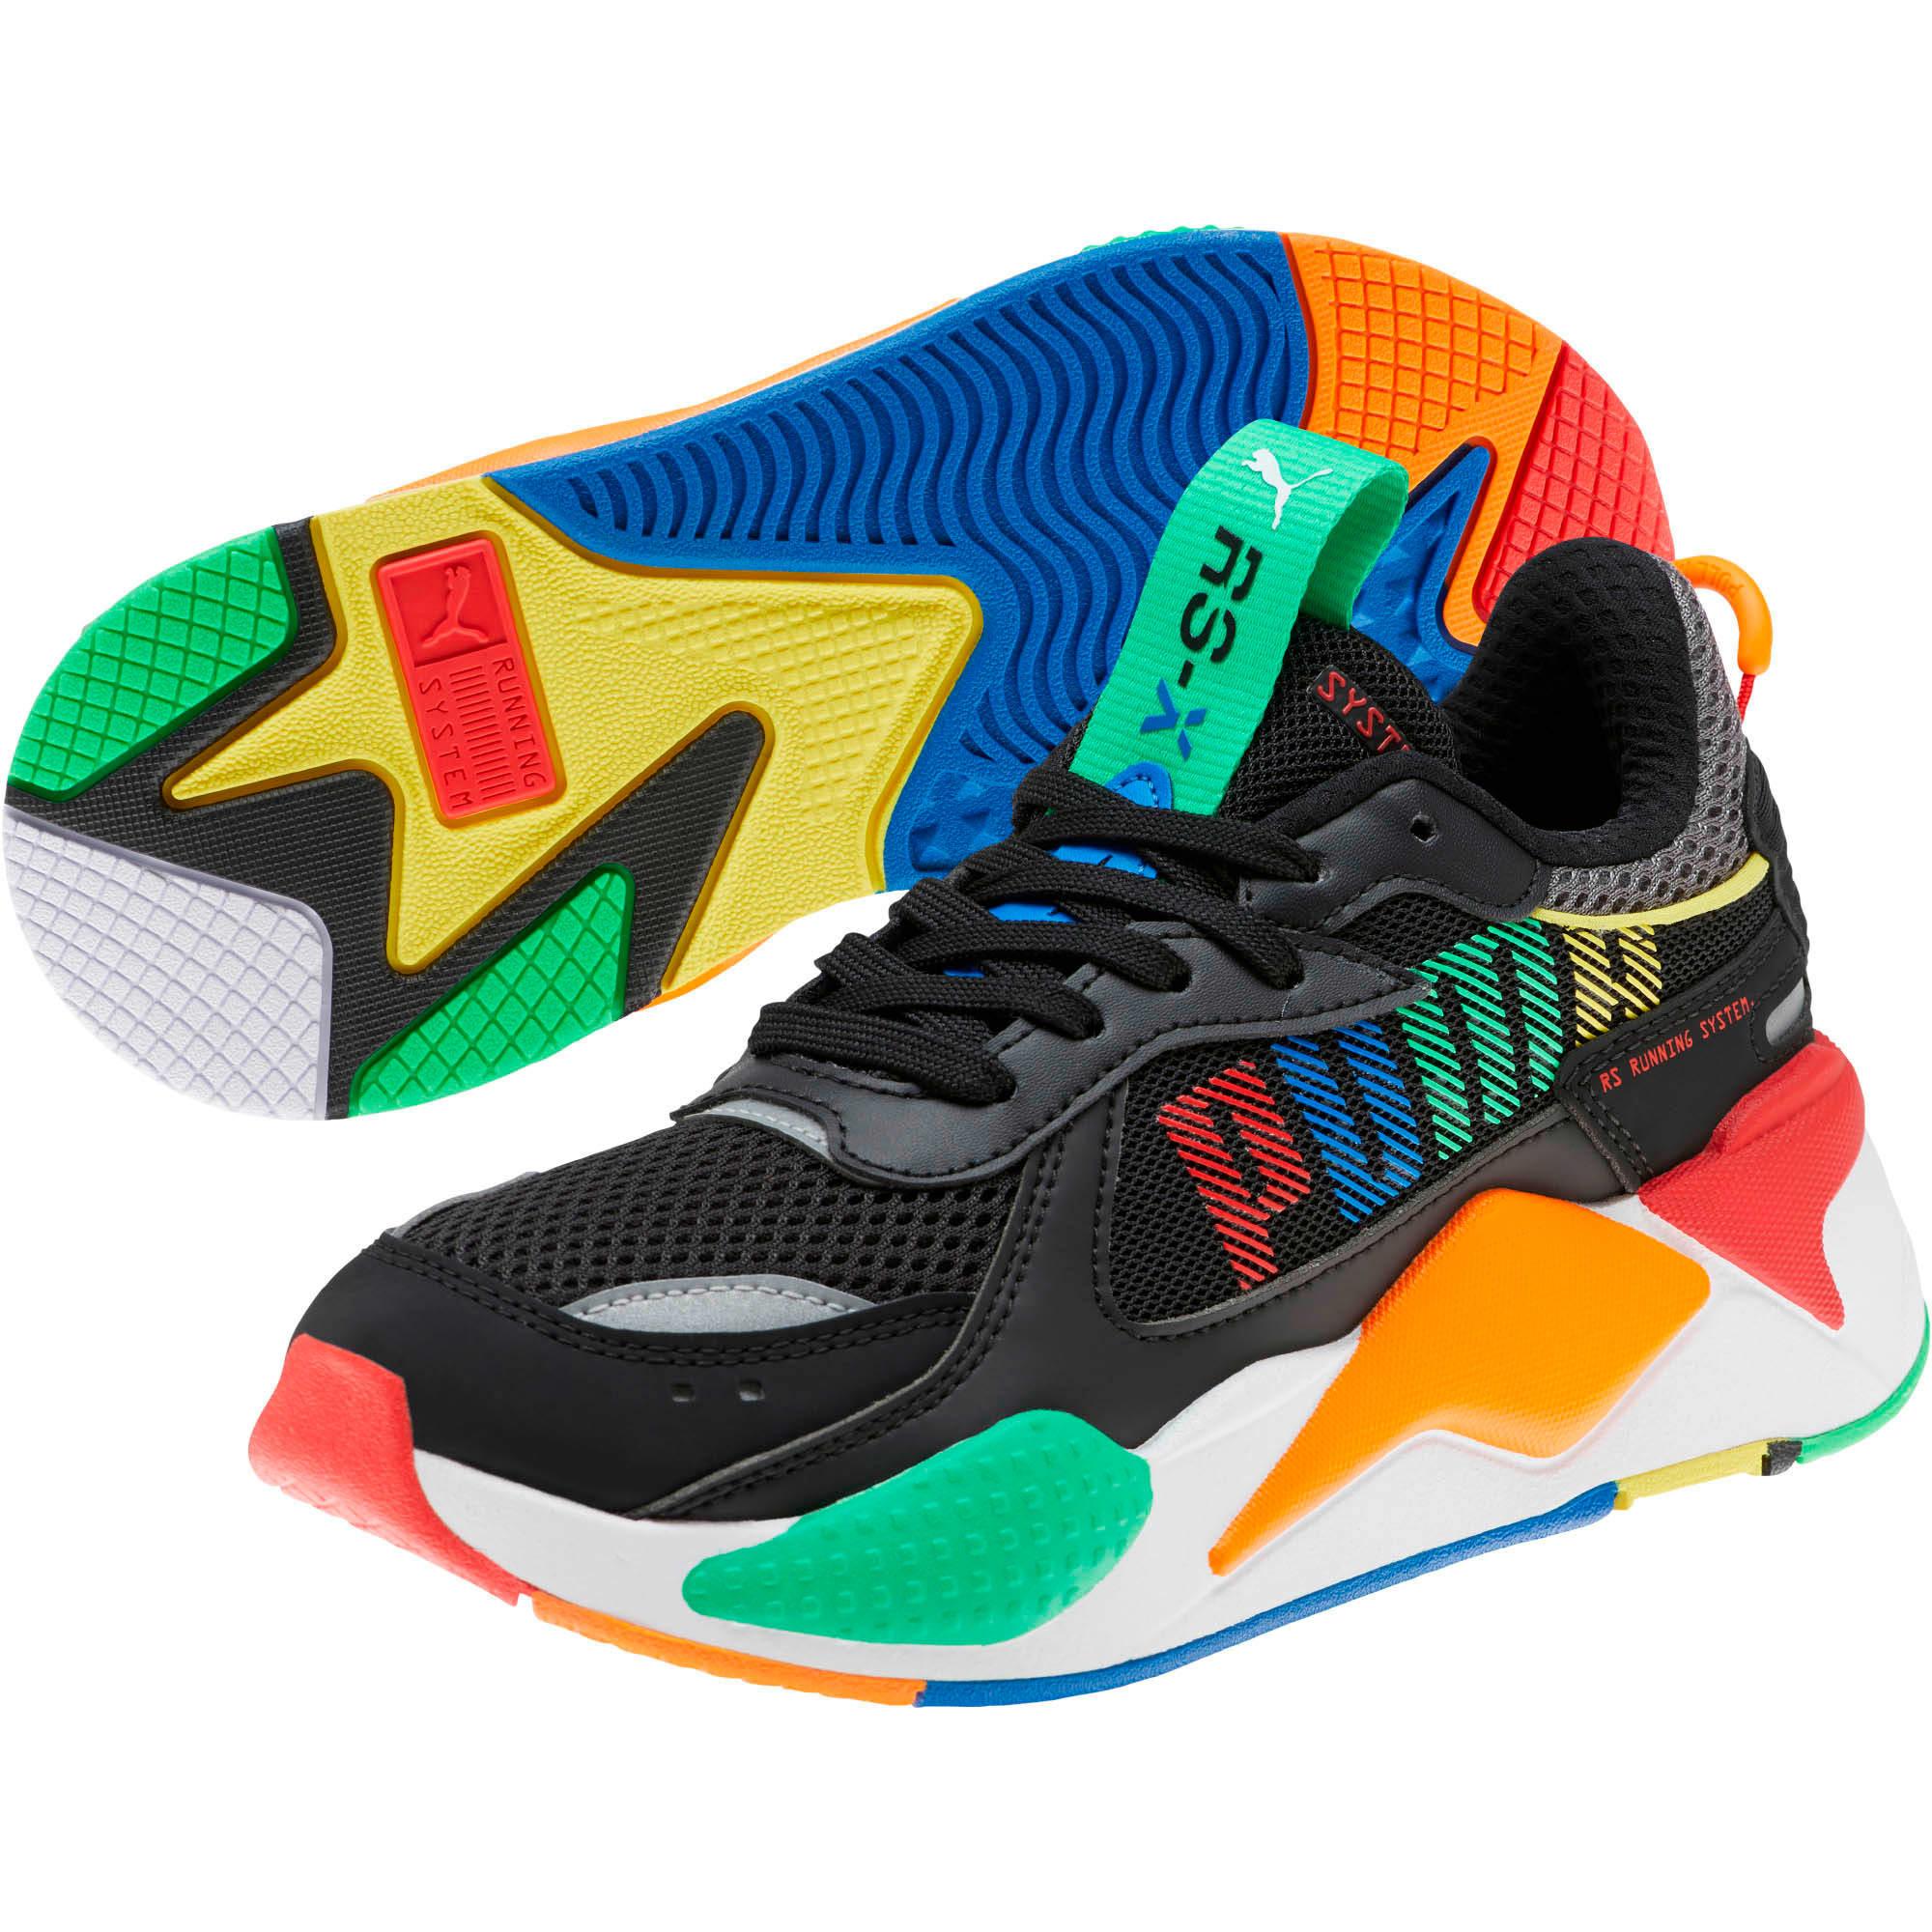 Thumbnail 2 of RS-X Bold Sneakers JR, P Black-ANDEAN TOUCAN-Orange, medium